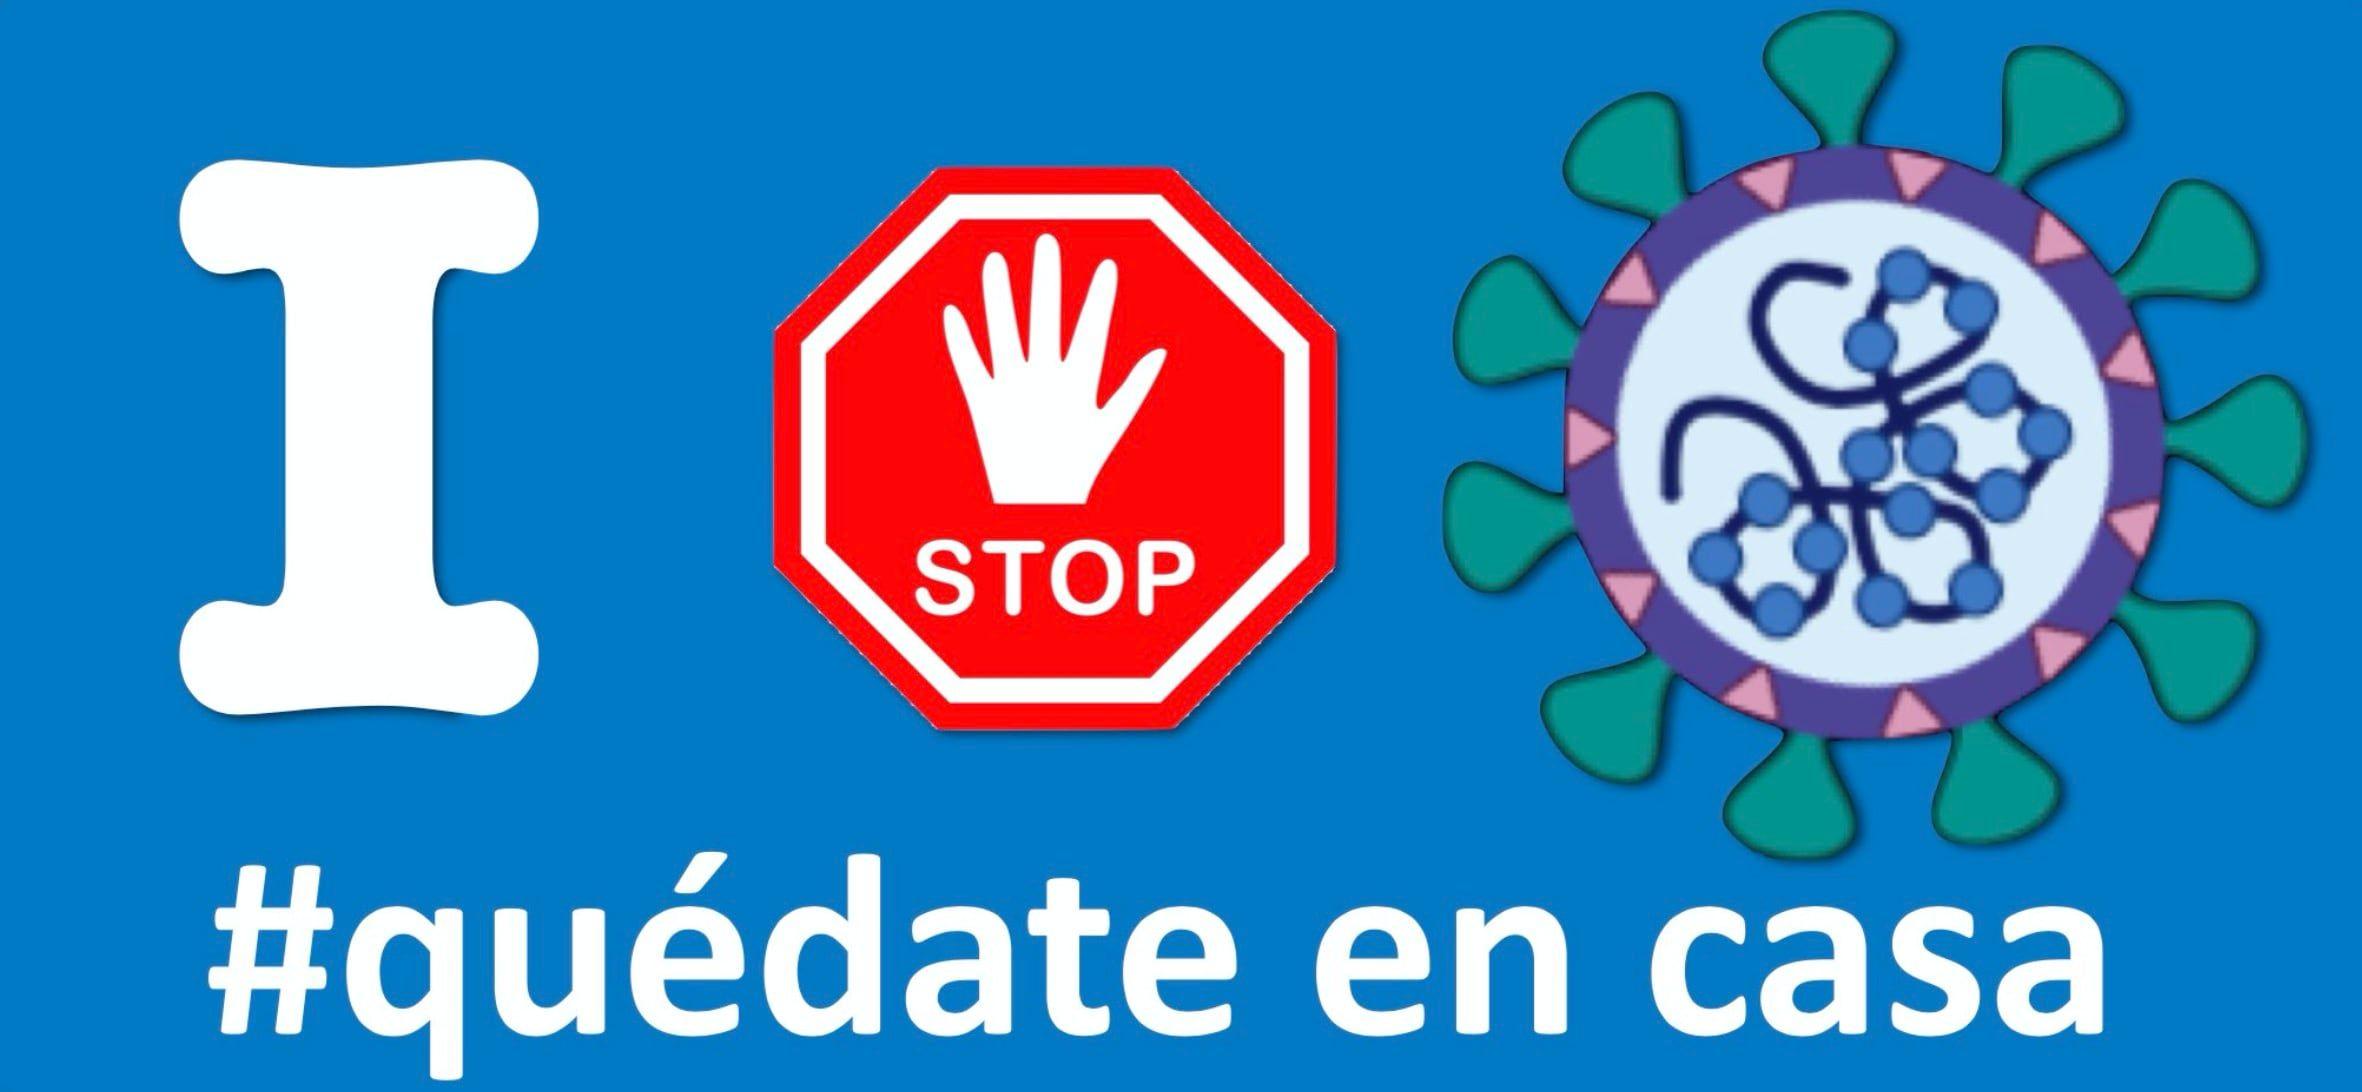 Memes De La Cuarentena Del Coronavirus